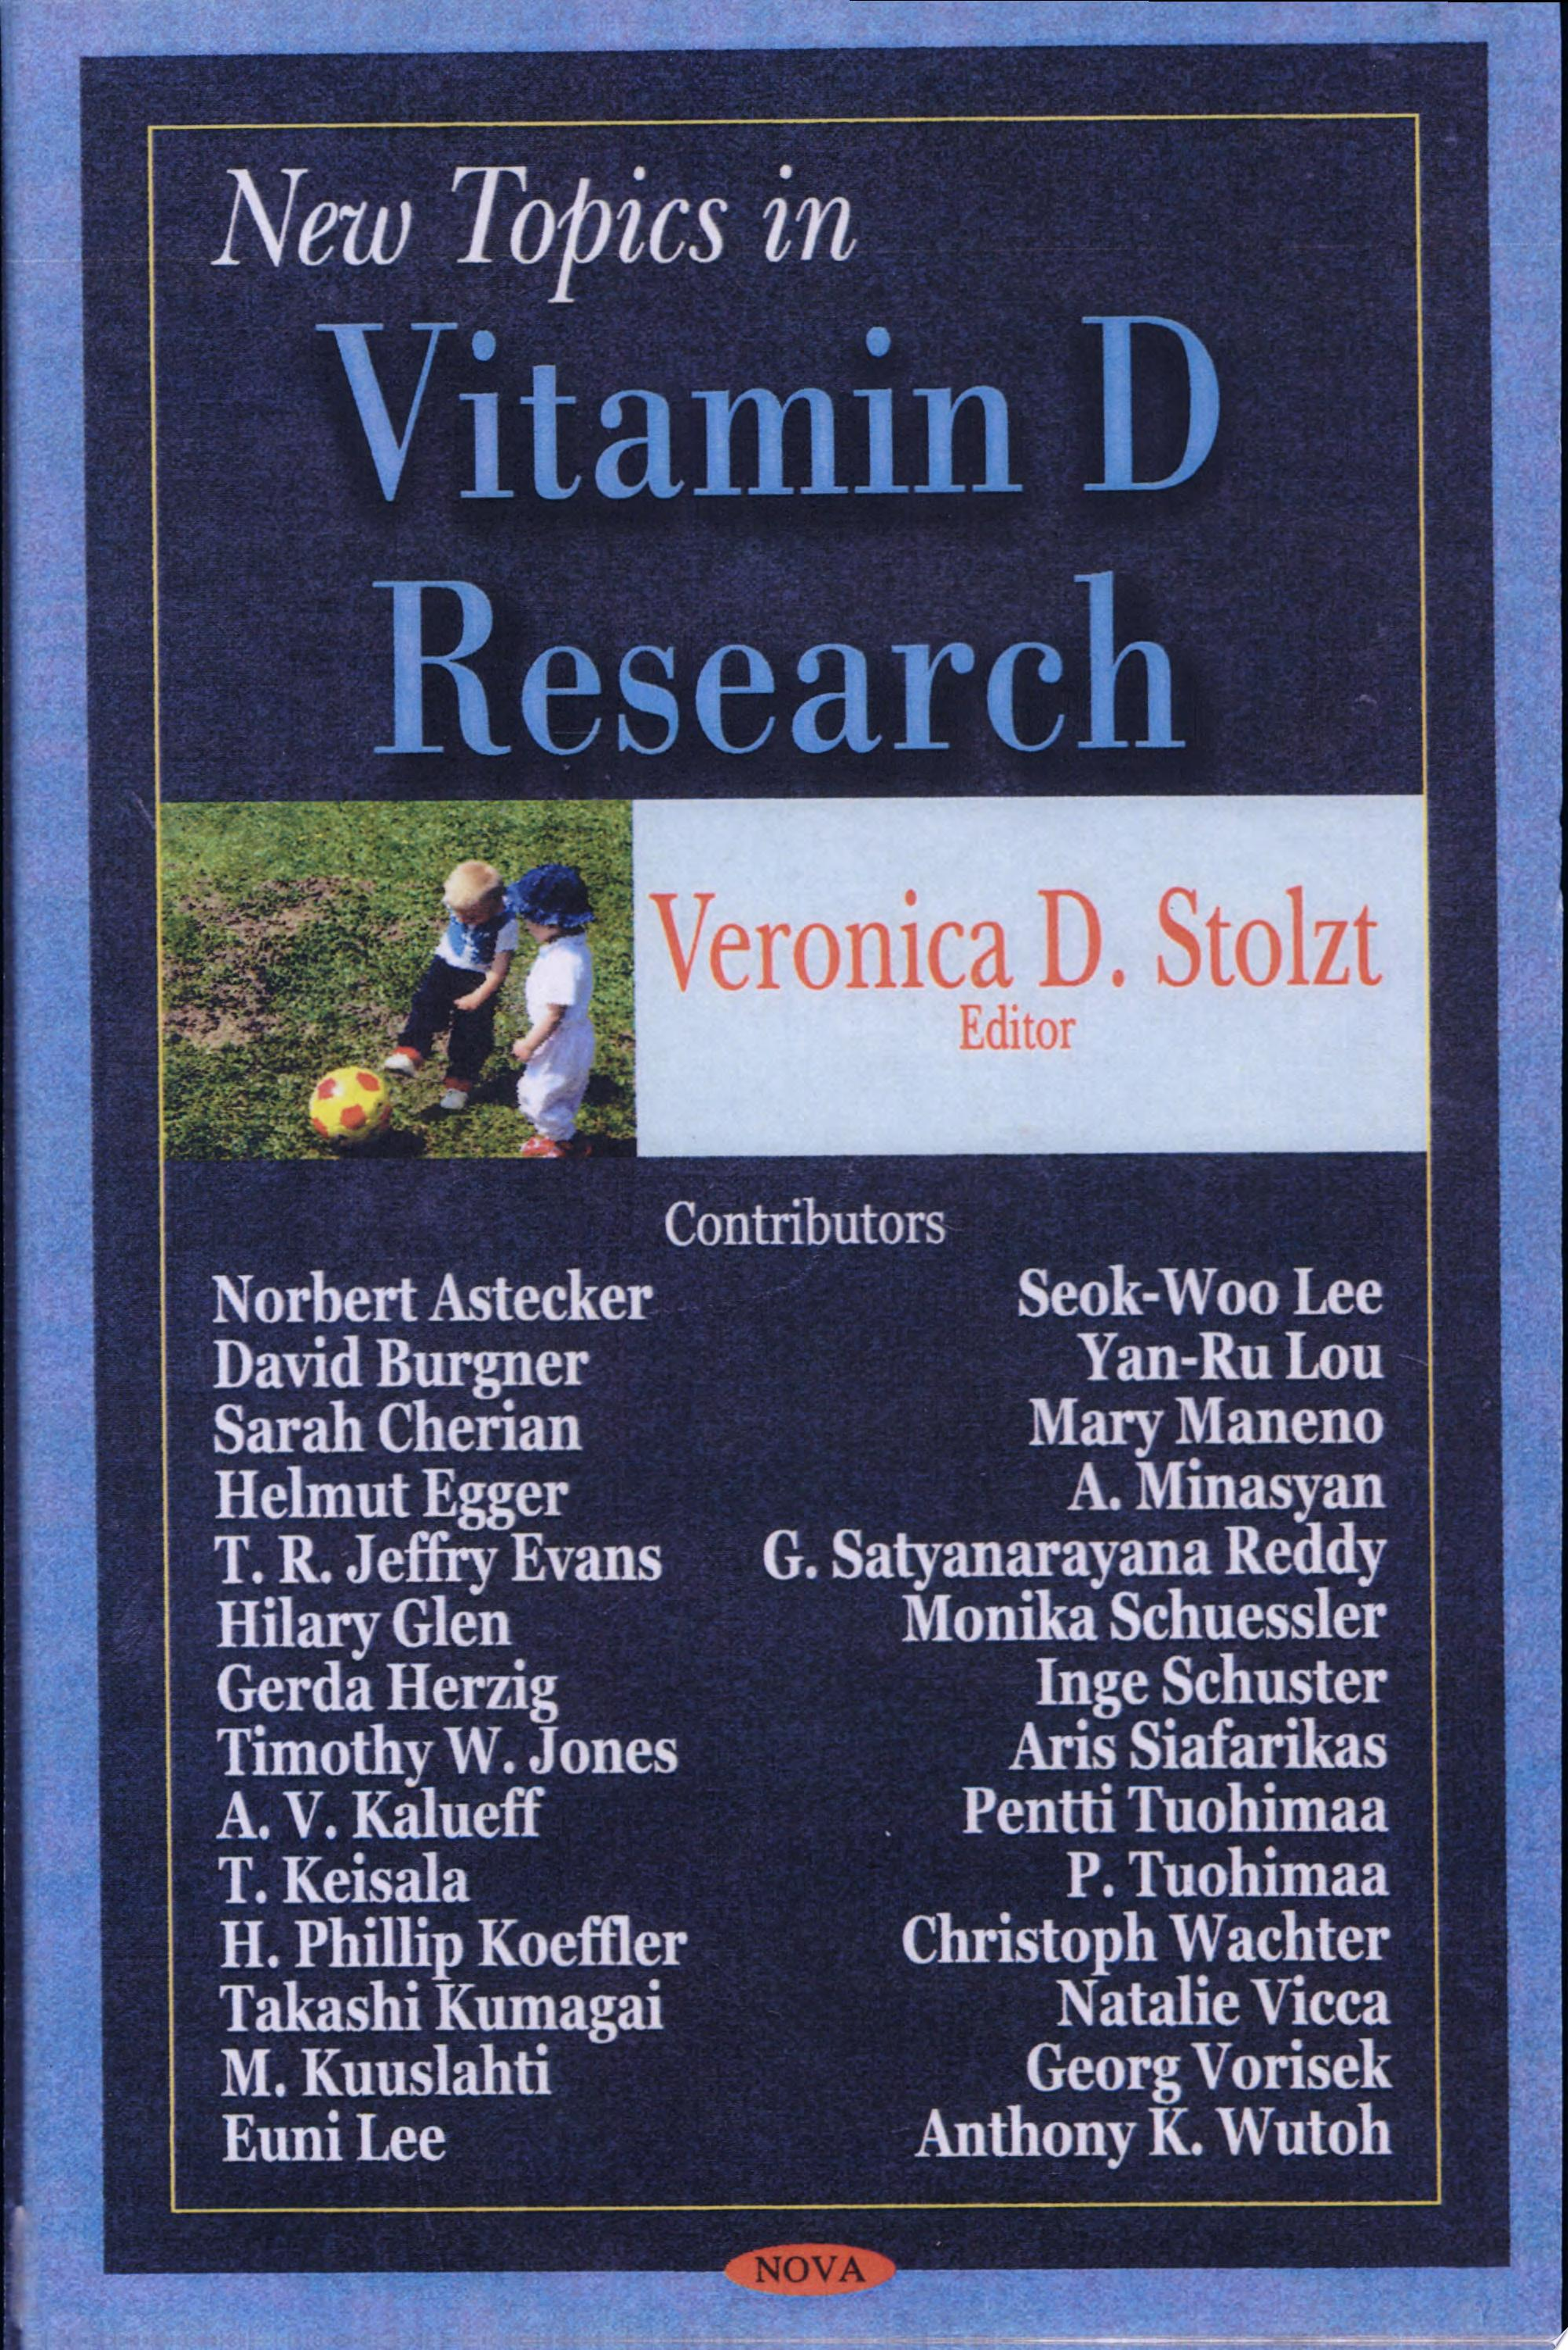 New Topics in Vitamin D Research